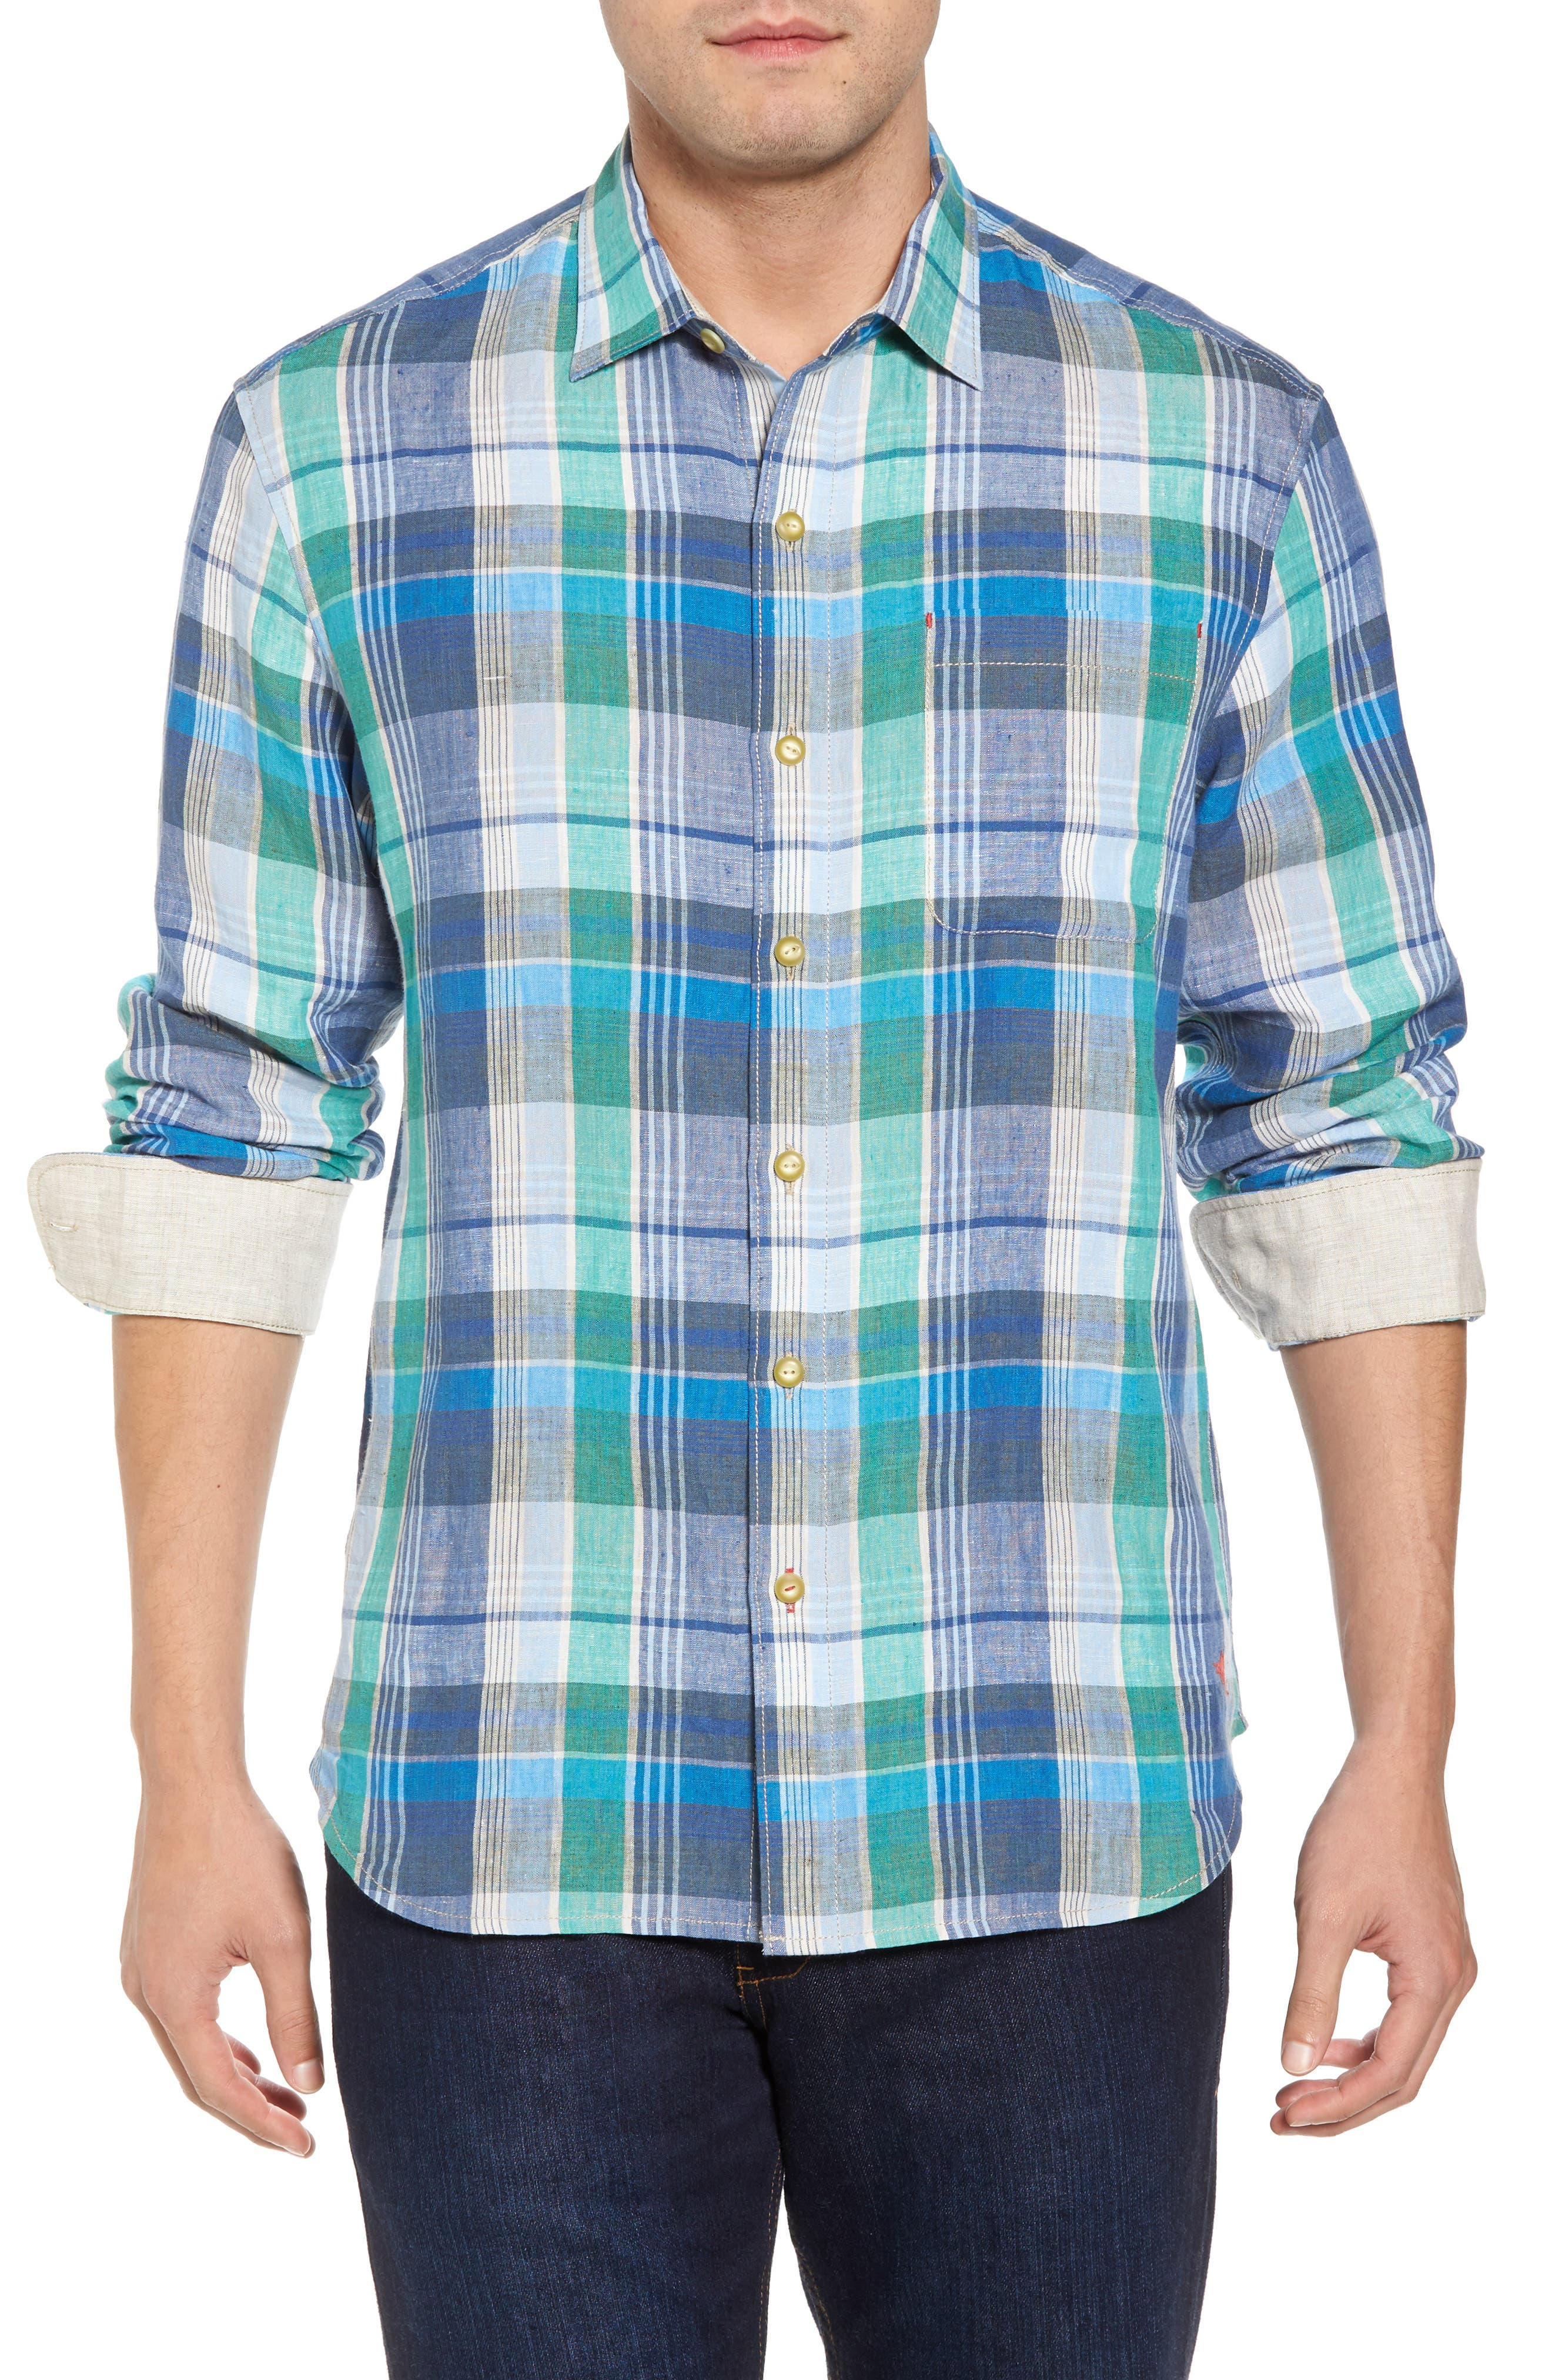 Alternate Image 1 Selected - Tommy Bahama Vero Beach Madras Plaid Linen Sport Shirt